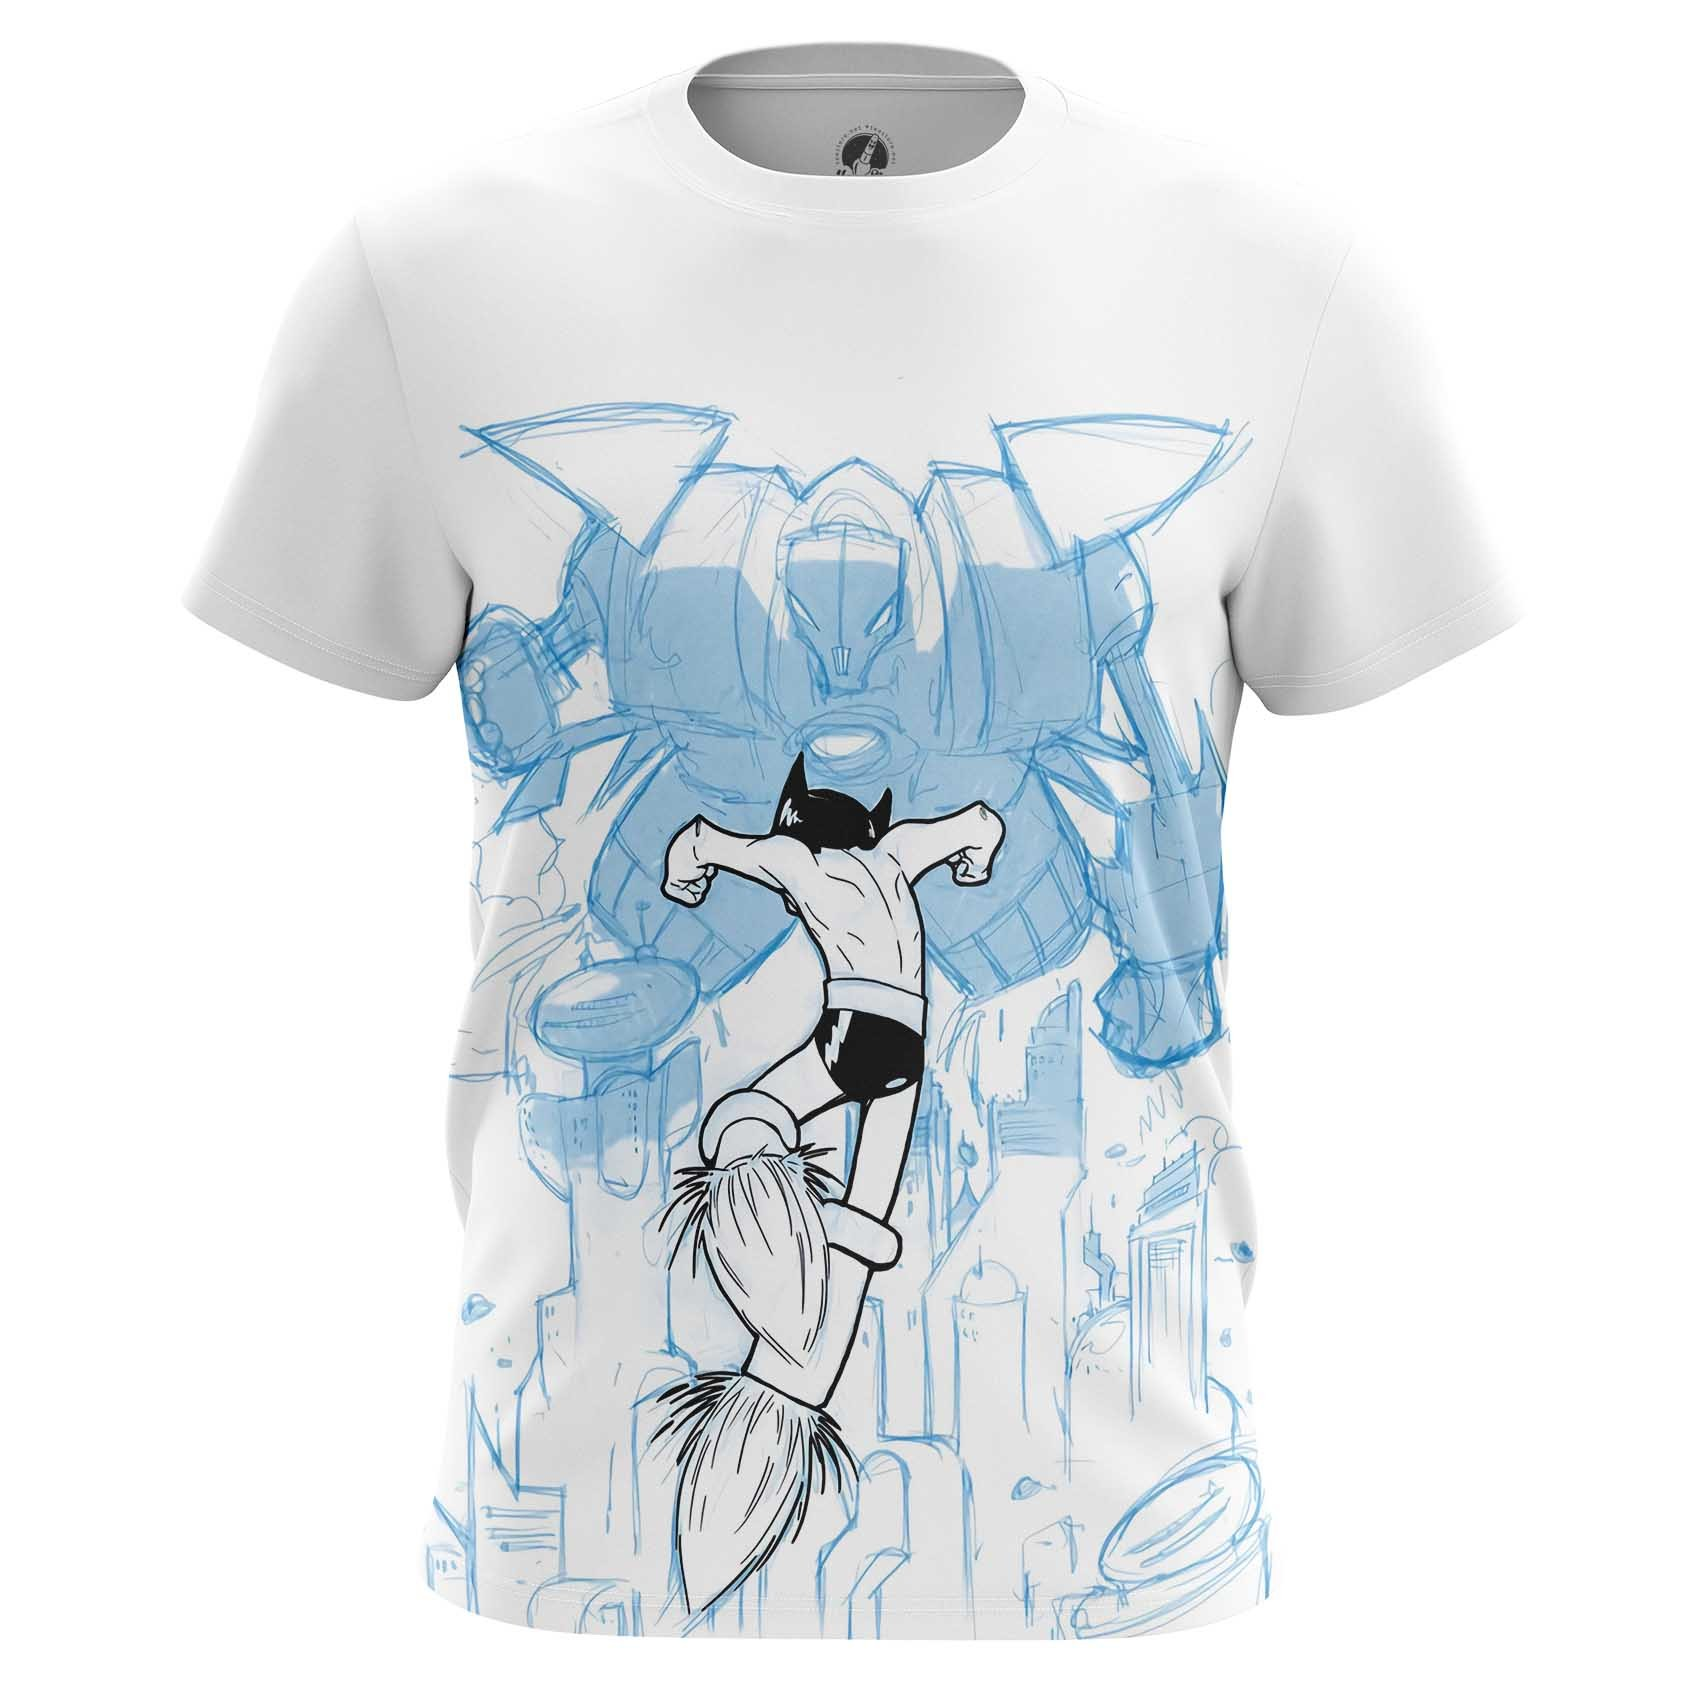 Merchandise T-Shirt Astro Boy Merch Astroboy Animation Japan